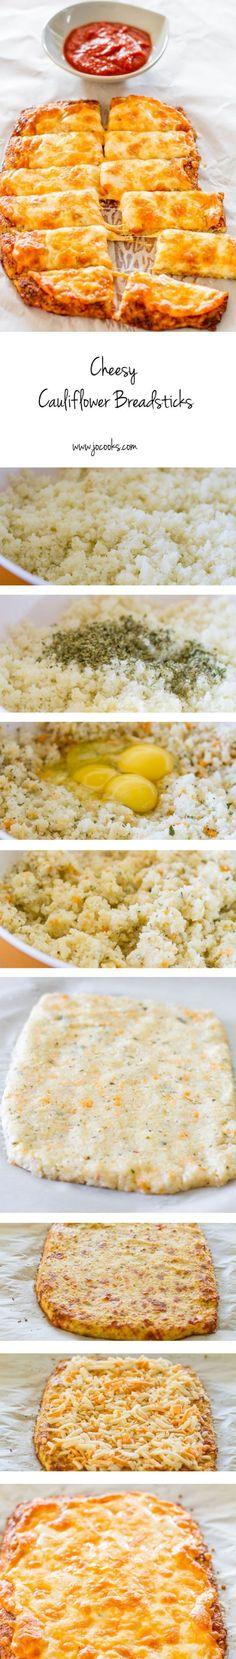 Cheesy Cauliflower Breadsticks Recipe